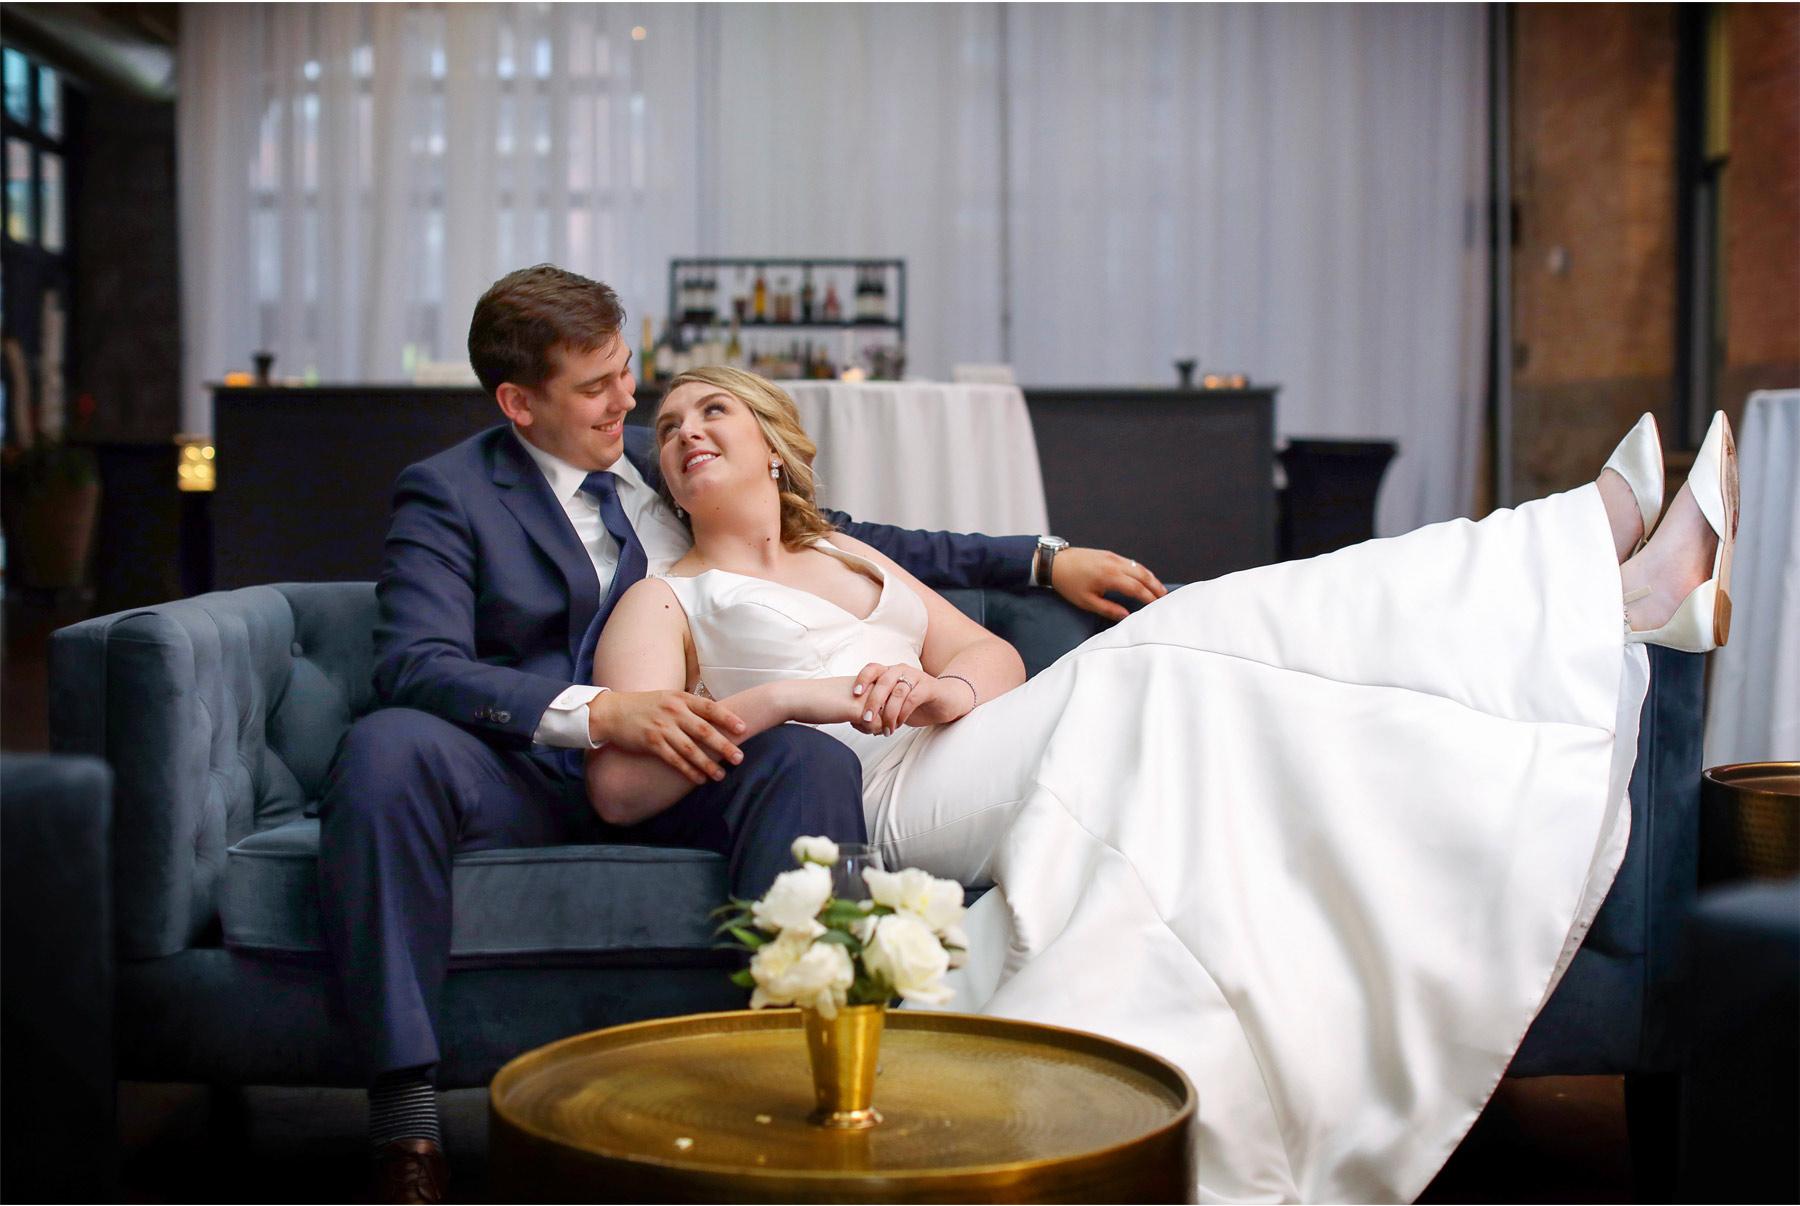 18-Minneapolis-Minnesota-Wedding-Vick-Photography-The-Depot-Lounge-Sofa-Bride-Groom-Amelia-and-Alexander.jpg